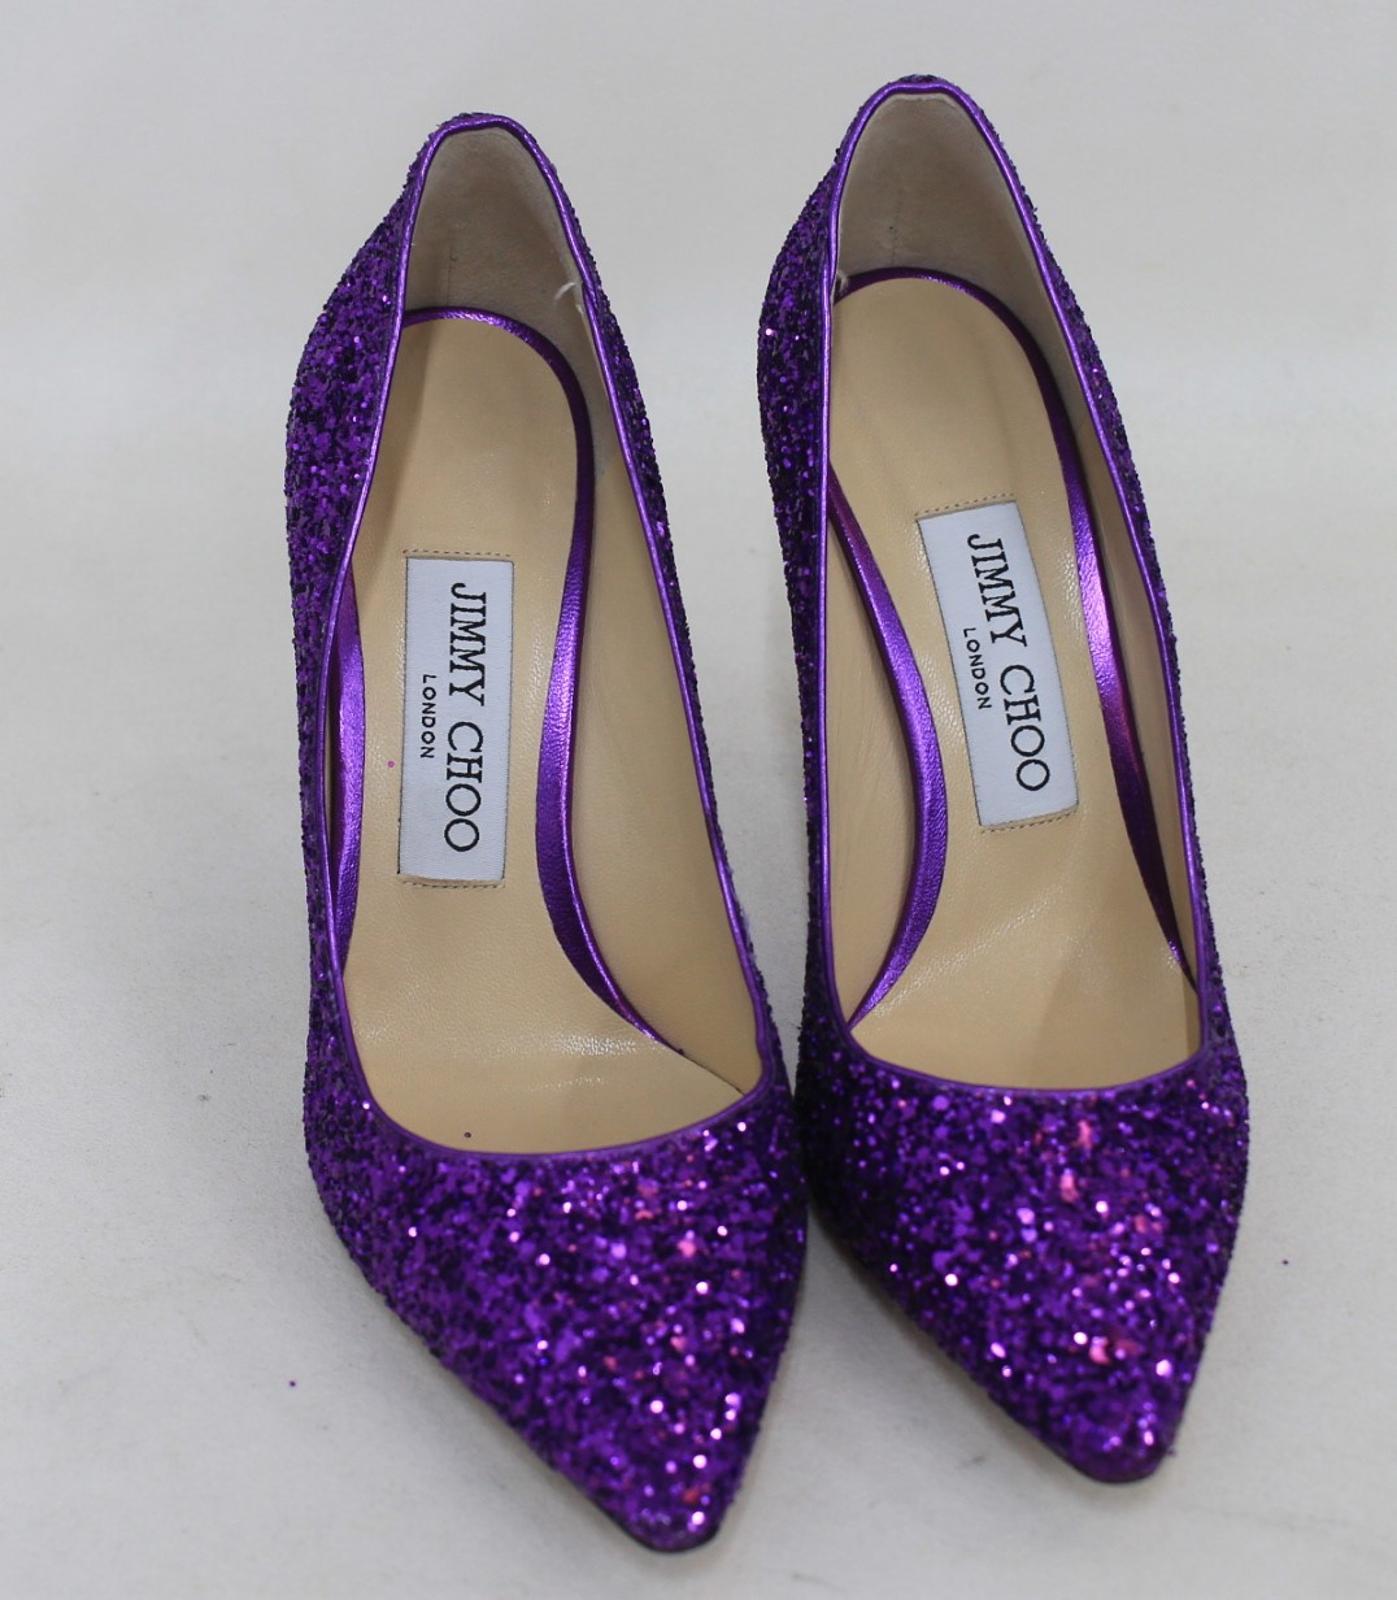 5 Choo Eu35 5 100 Purple High Romy Glitter Ladies Uk2 Shoes Heel Jimmy 7Pqdd